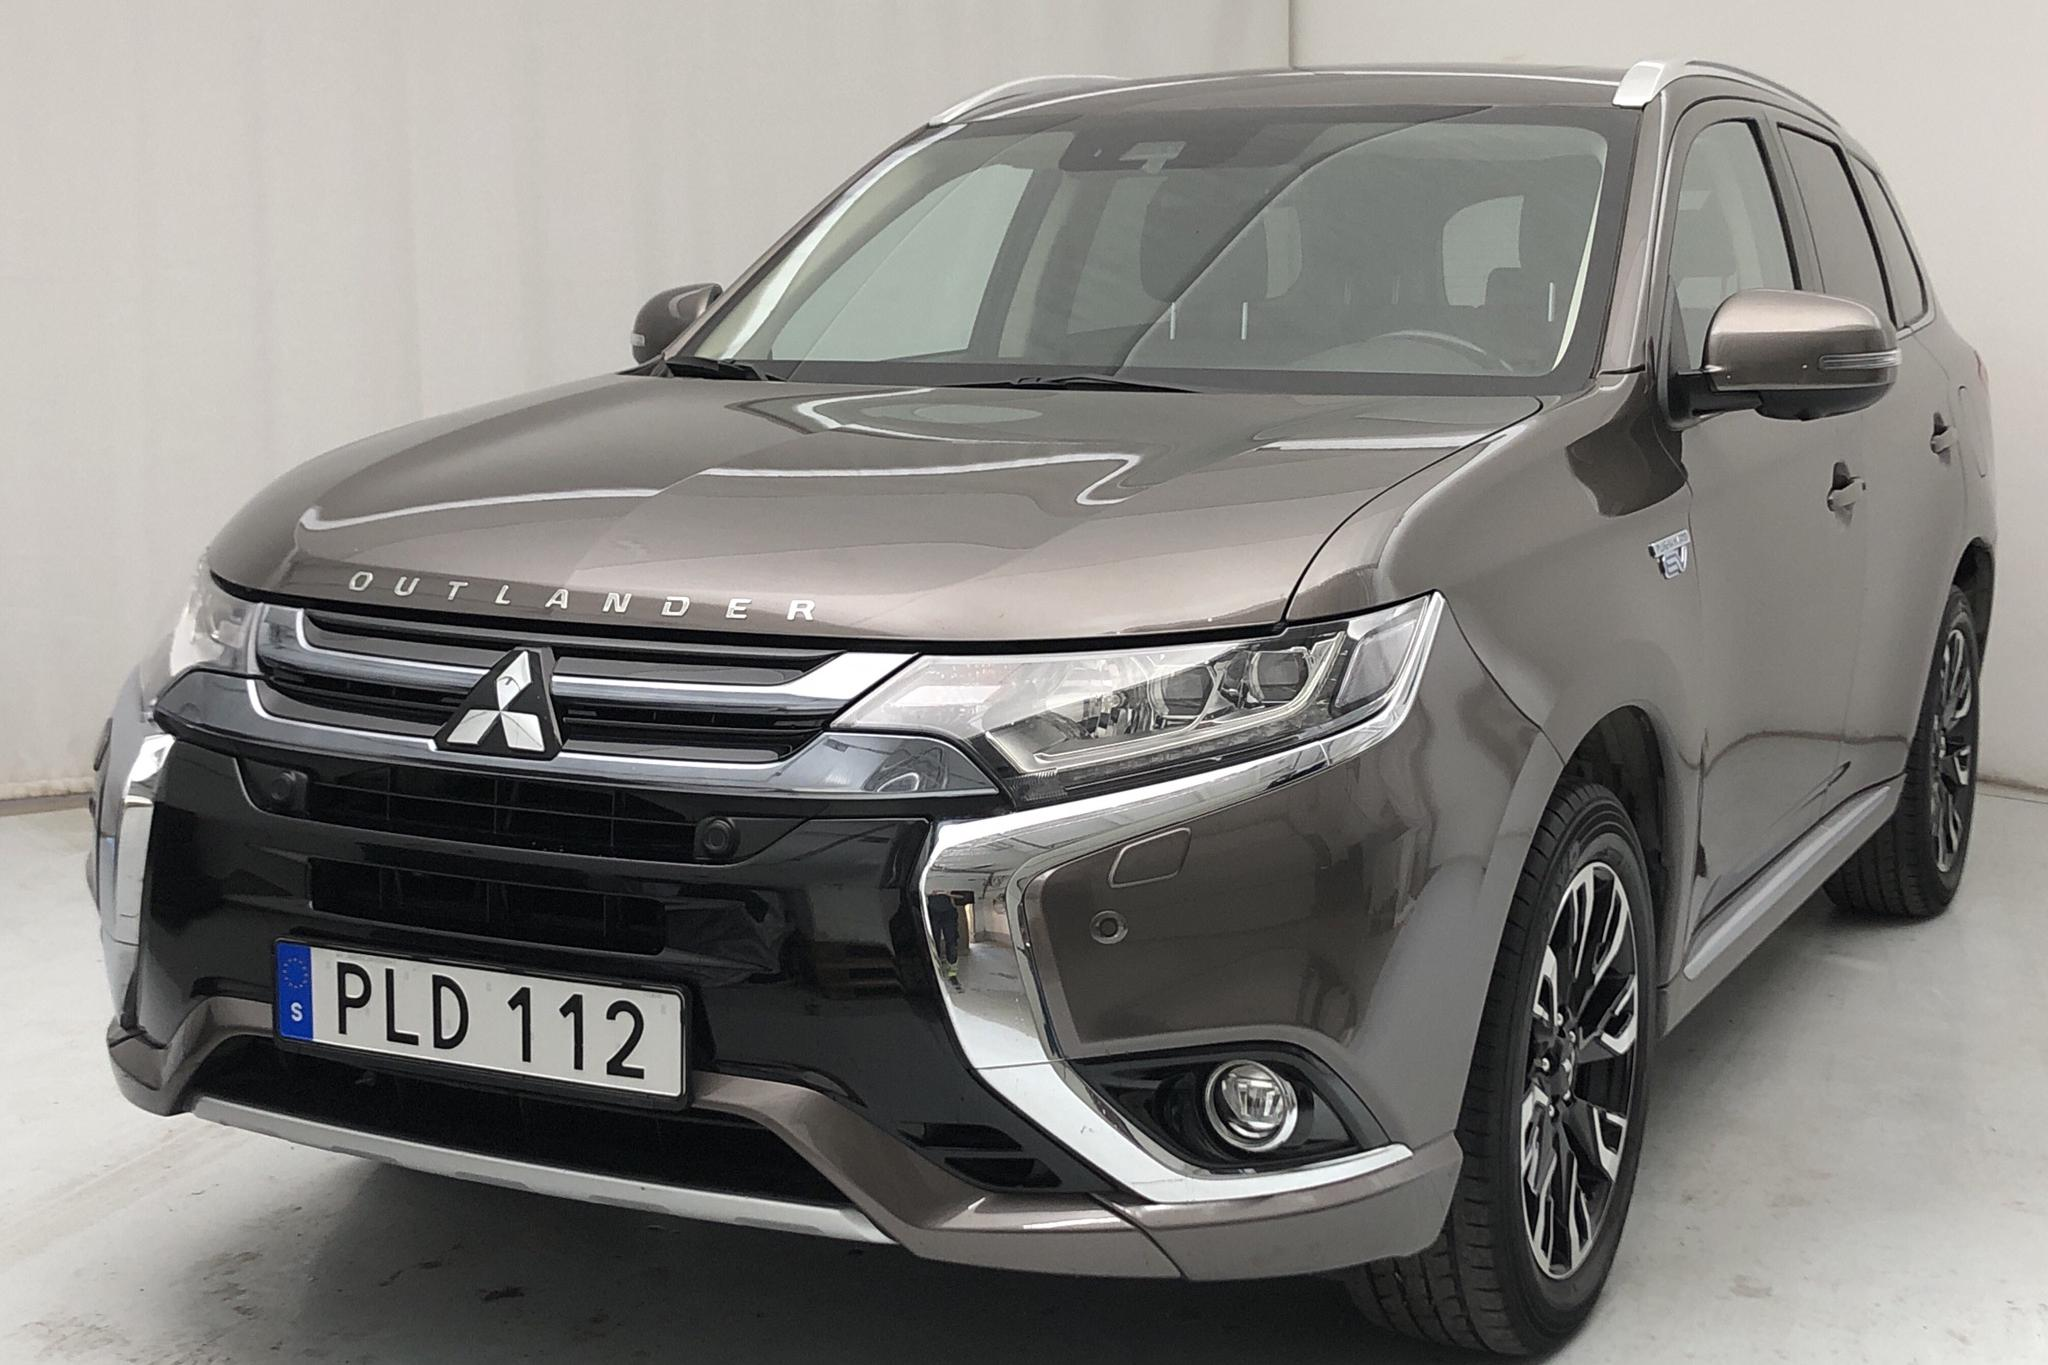 Mitsubishi Outlander 2.0 Plug-in Hybrid 4WD (121hk) - 68 580 km - Automatic - brown - 2017